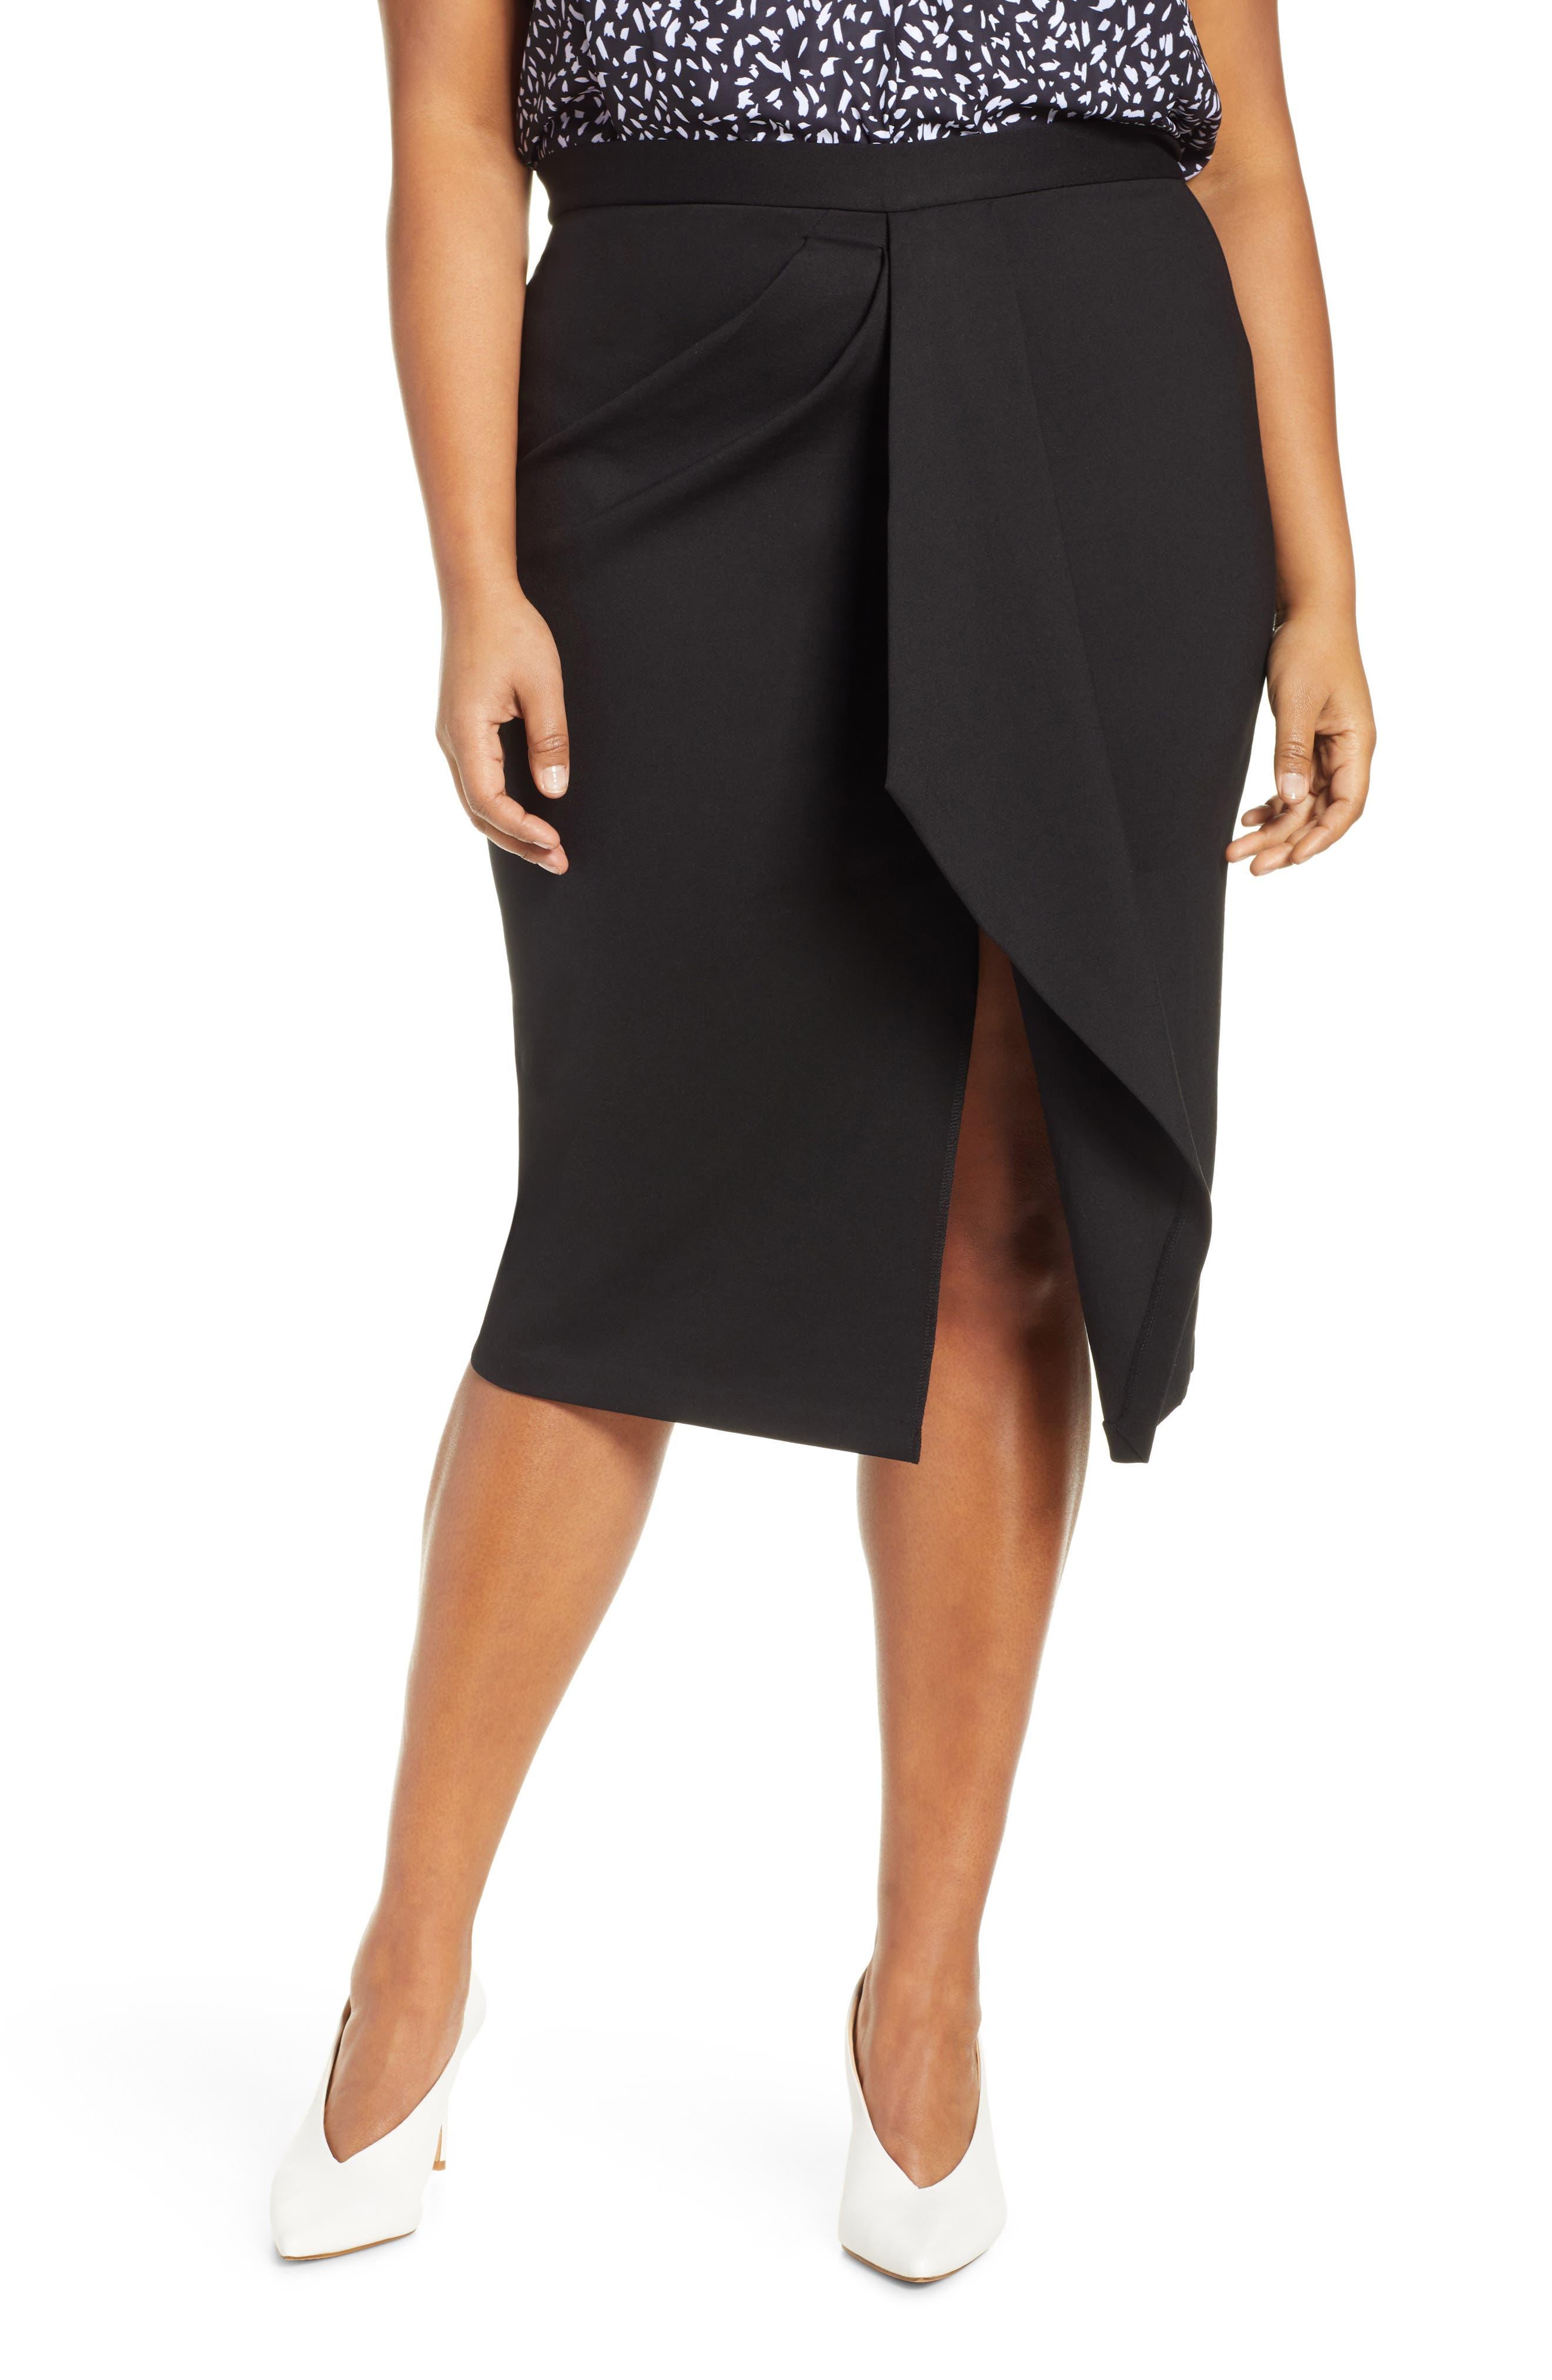 Plus Size Jason Wu X Eloquii Asymmetrical Drape Pencil Skirt, Black